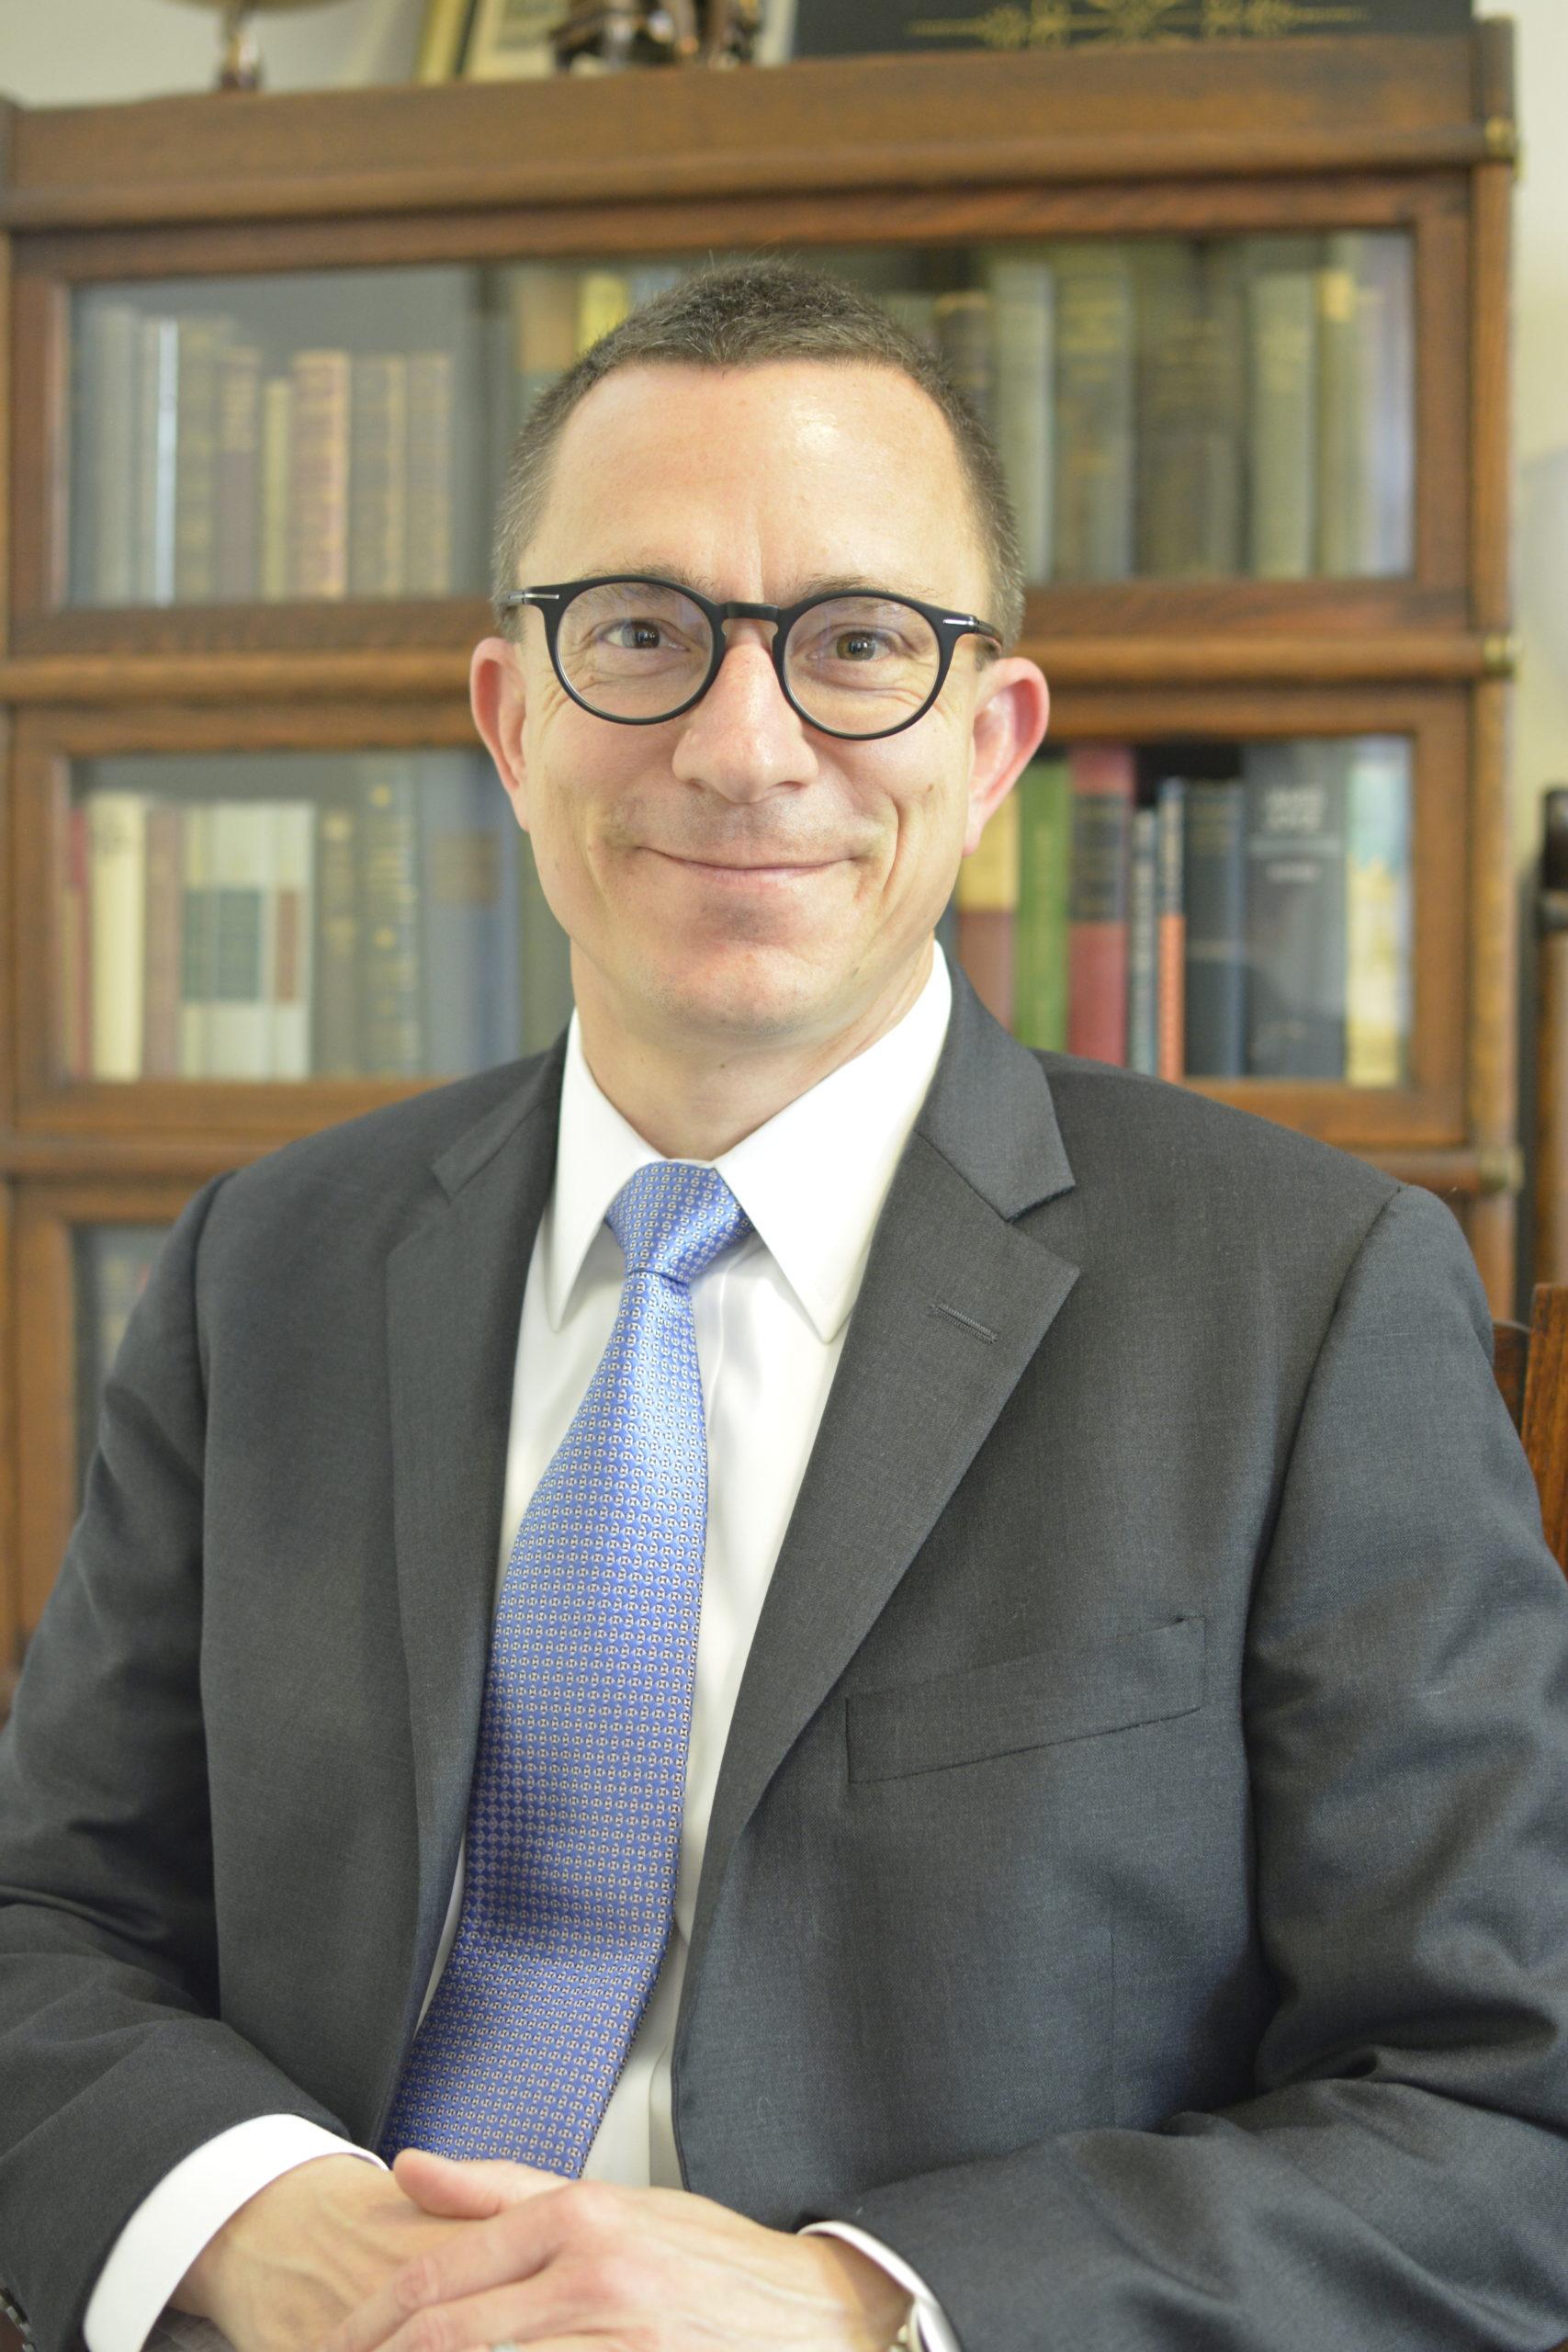 Donald Kochan